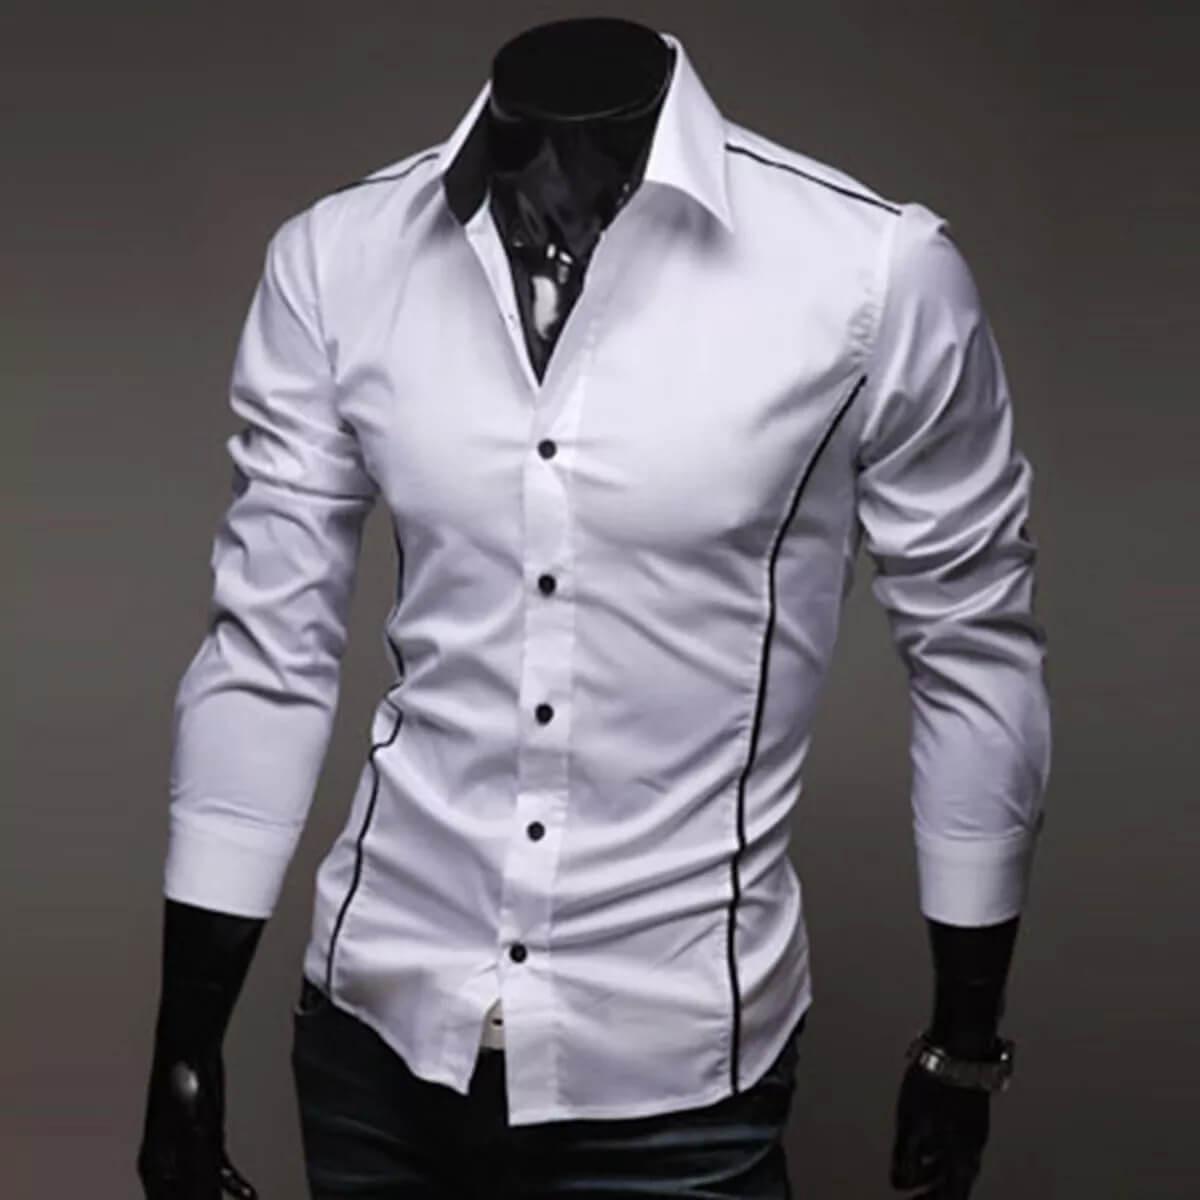 Camisa Social Masculina Slim Fit Luxo Estilosa Branca